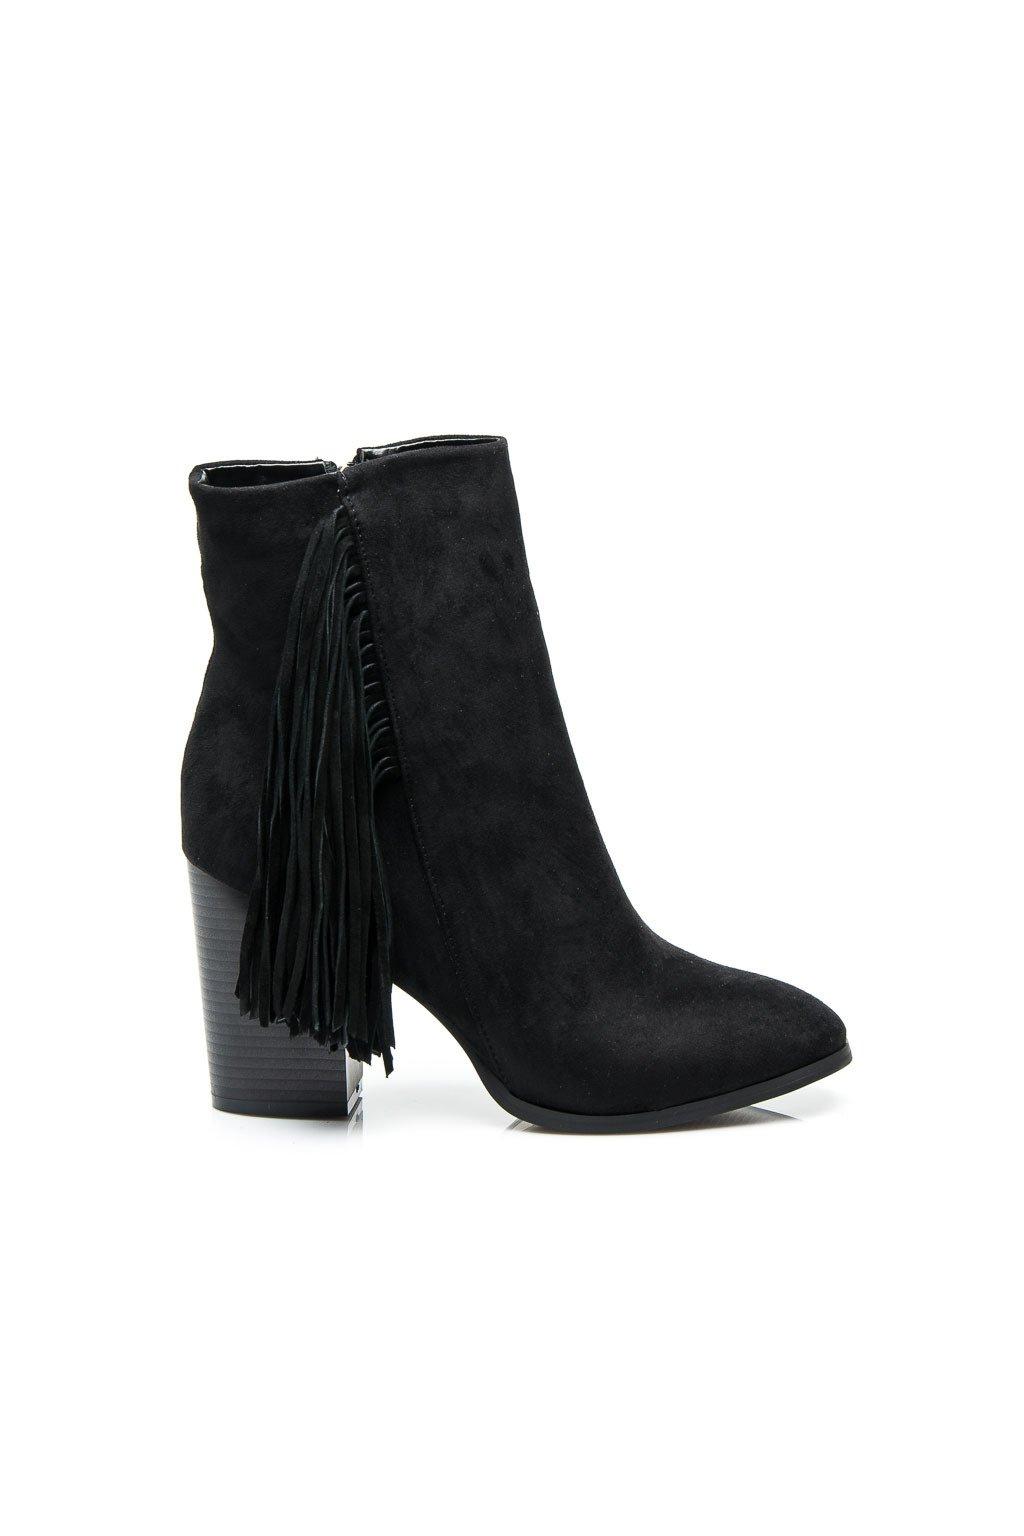 Čierne topánky v štýle BOHO ES-2381B   D3-L45  f197a294836